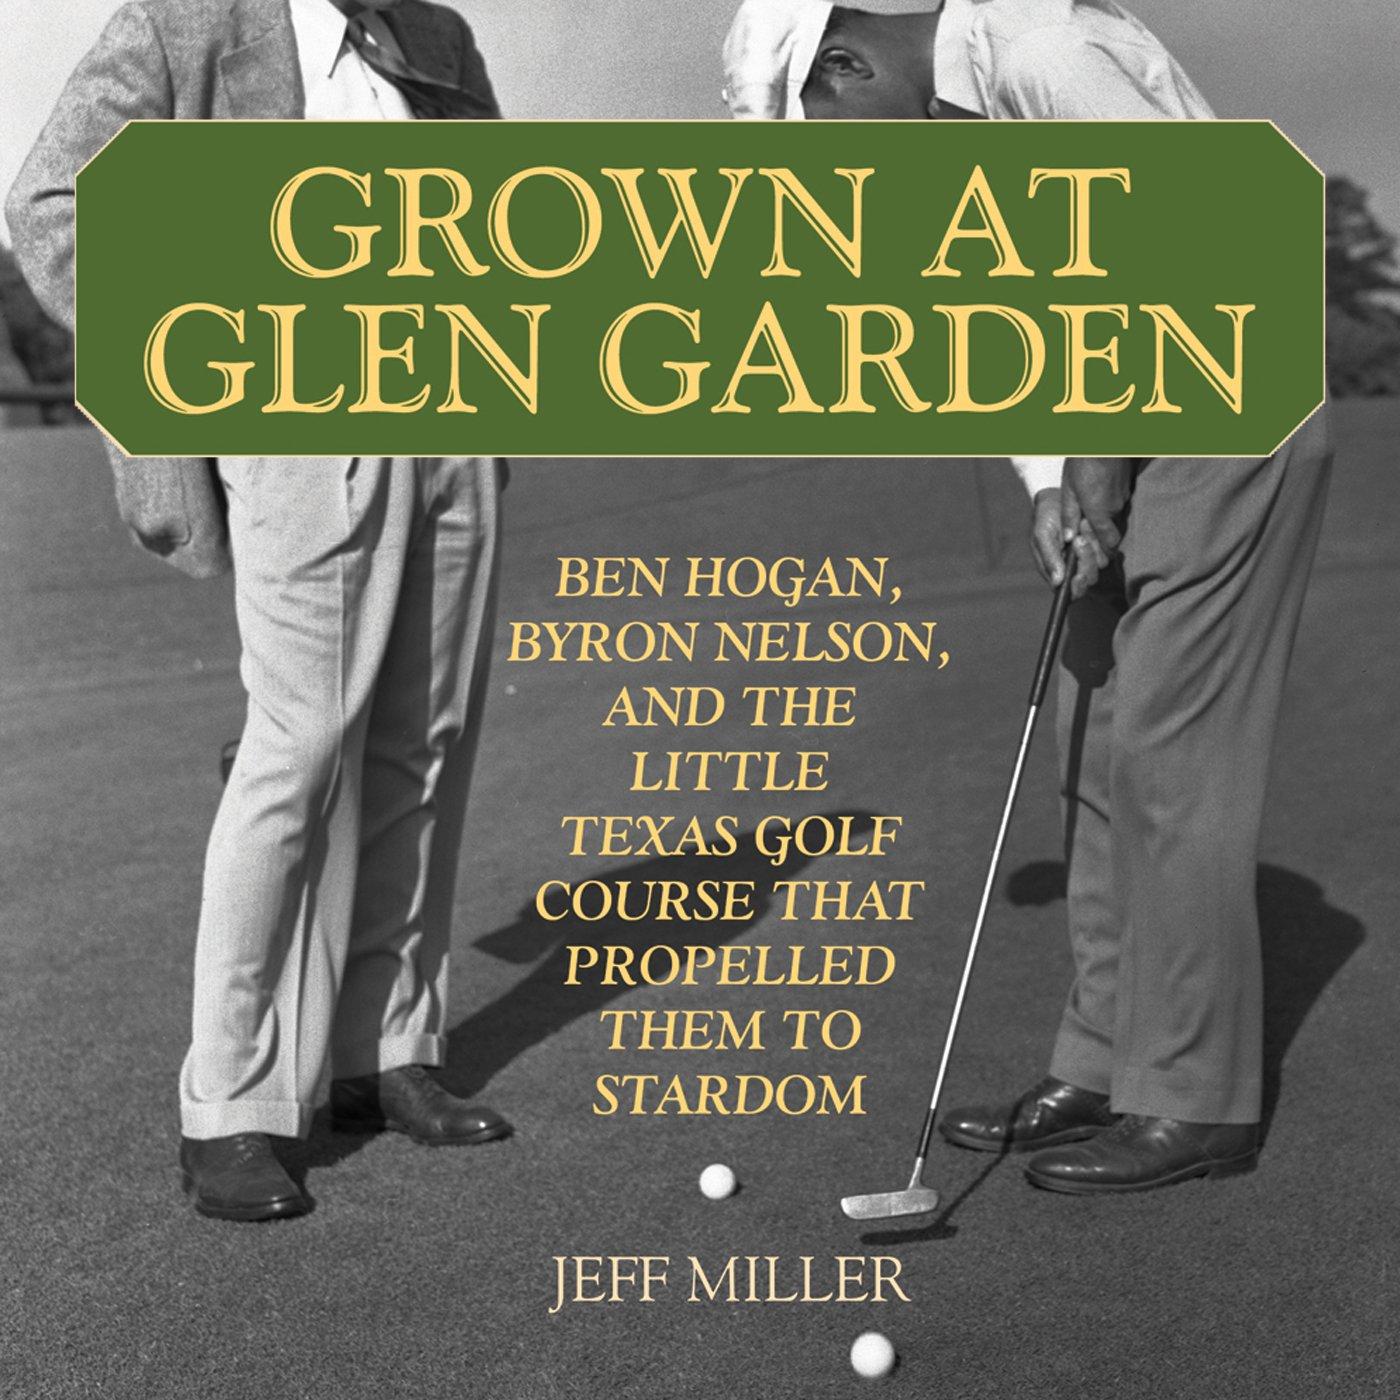 Grown at Glen Garden: How Golf Legends Ben Hogan and Byron Nelson Got Their Starts at the Same Course